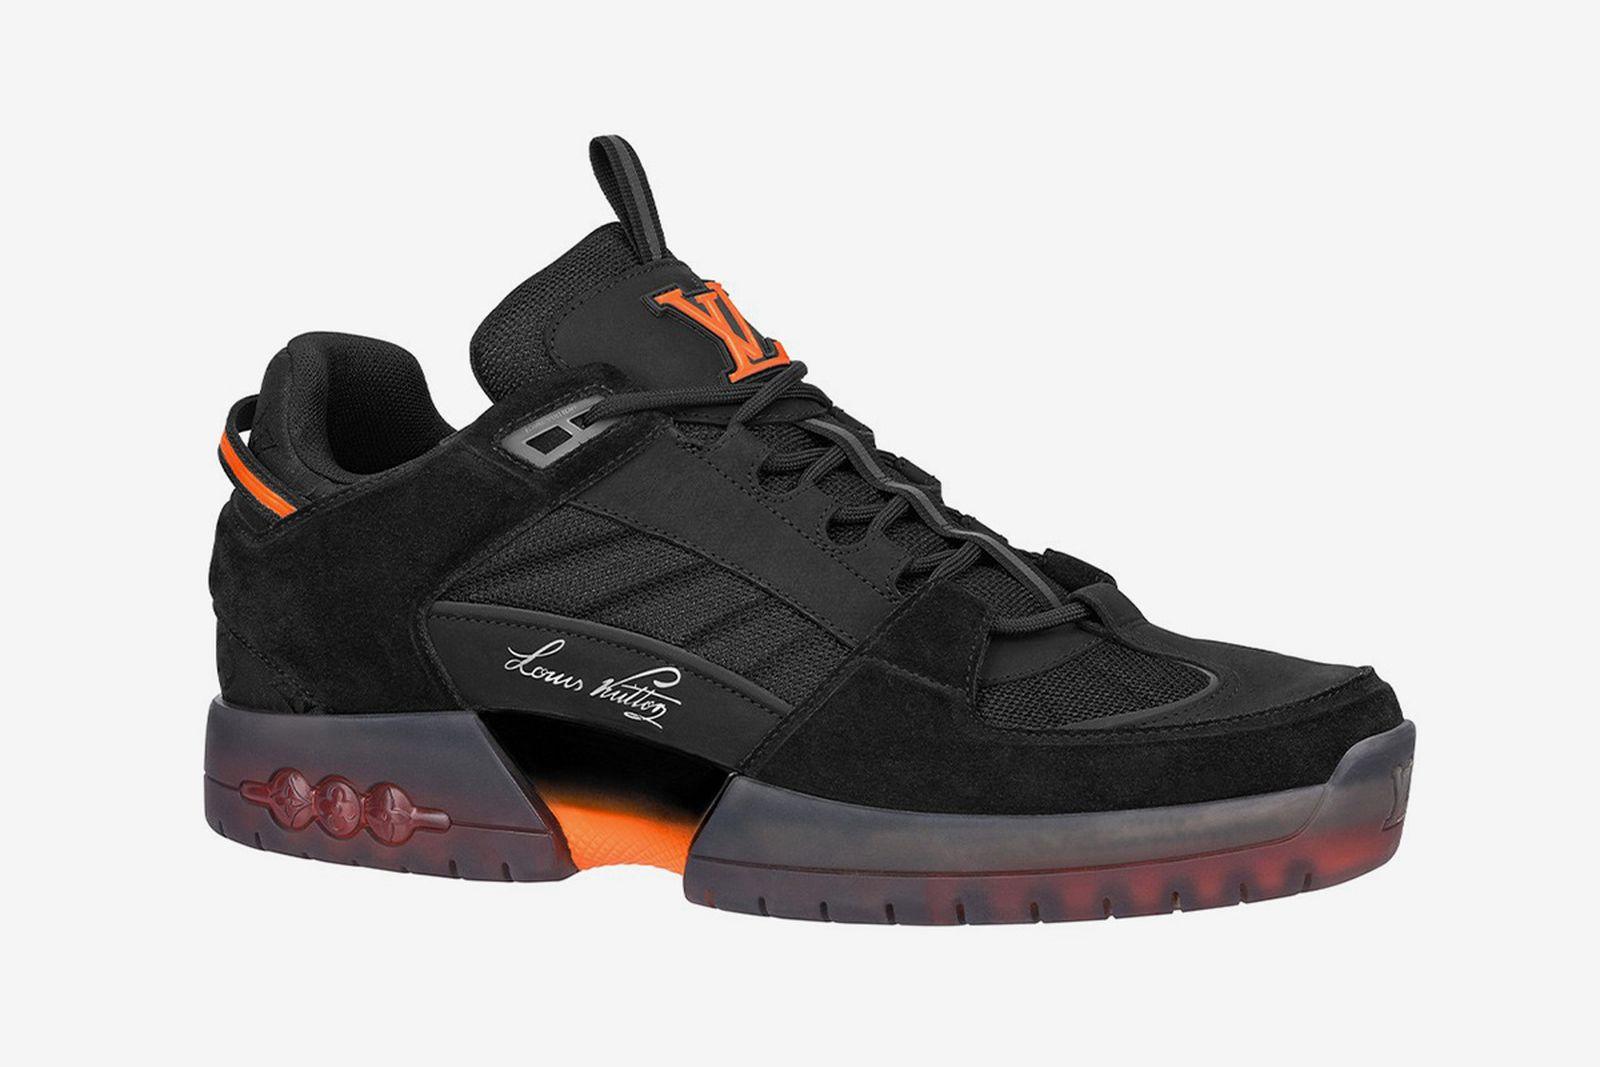 lucien-clarke-louis-vuitton-skate-shoe-release-date-price-01